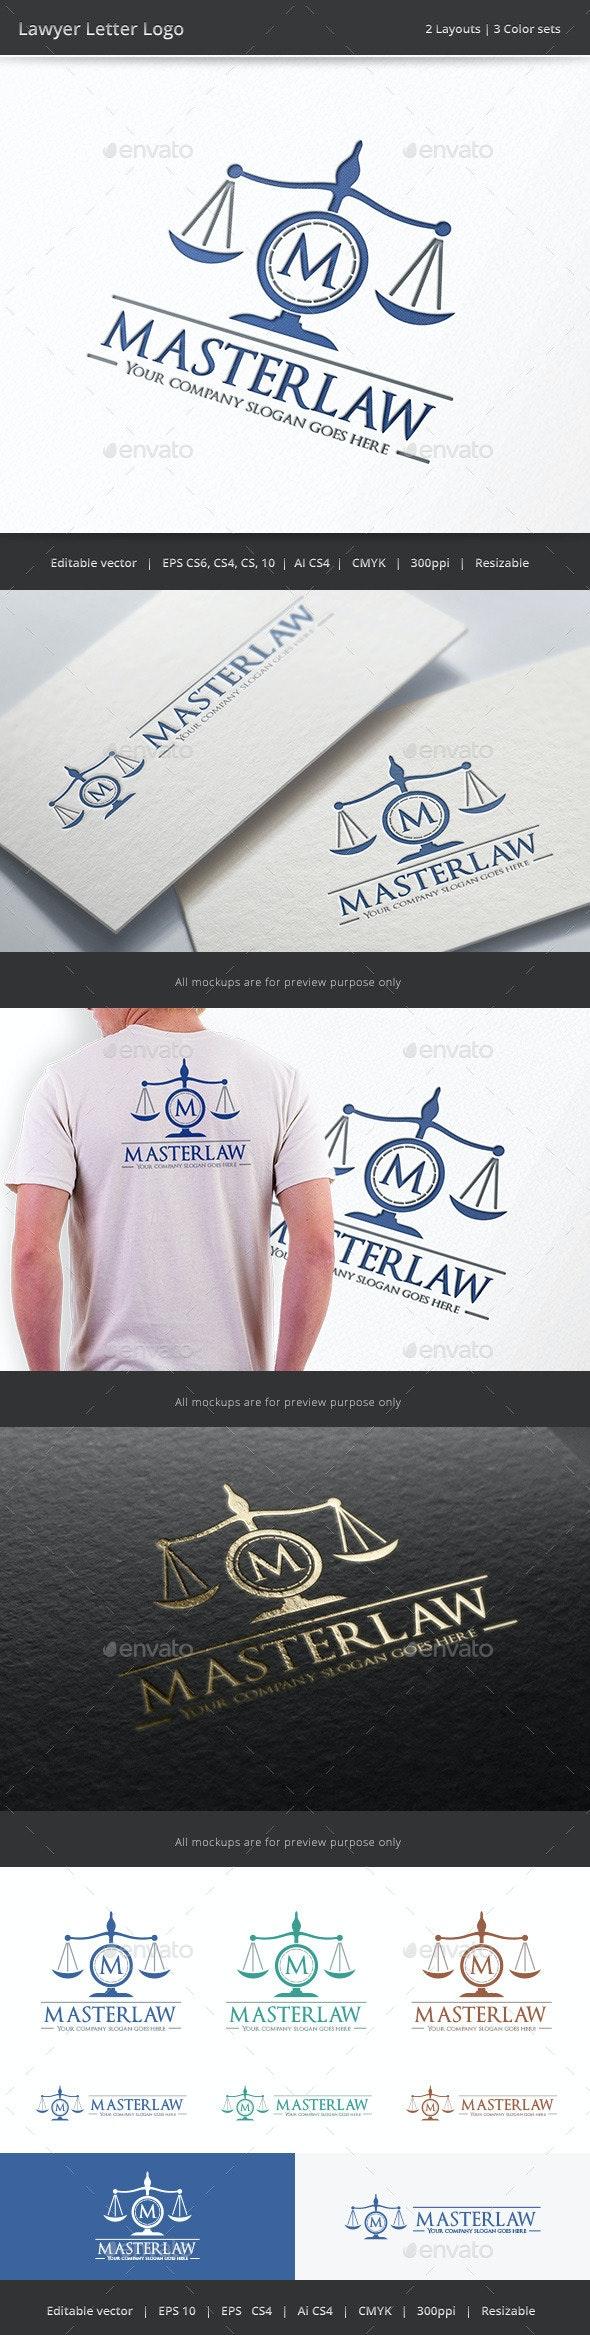 Lawyer Letter Logo - Objects Logo Templates